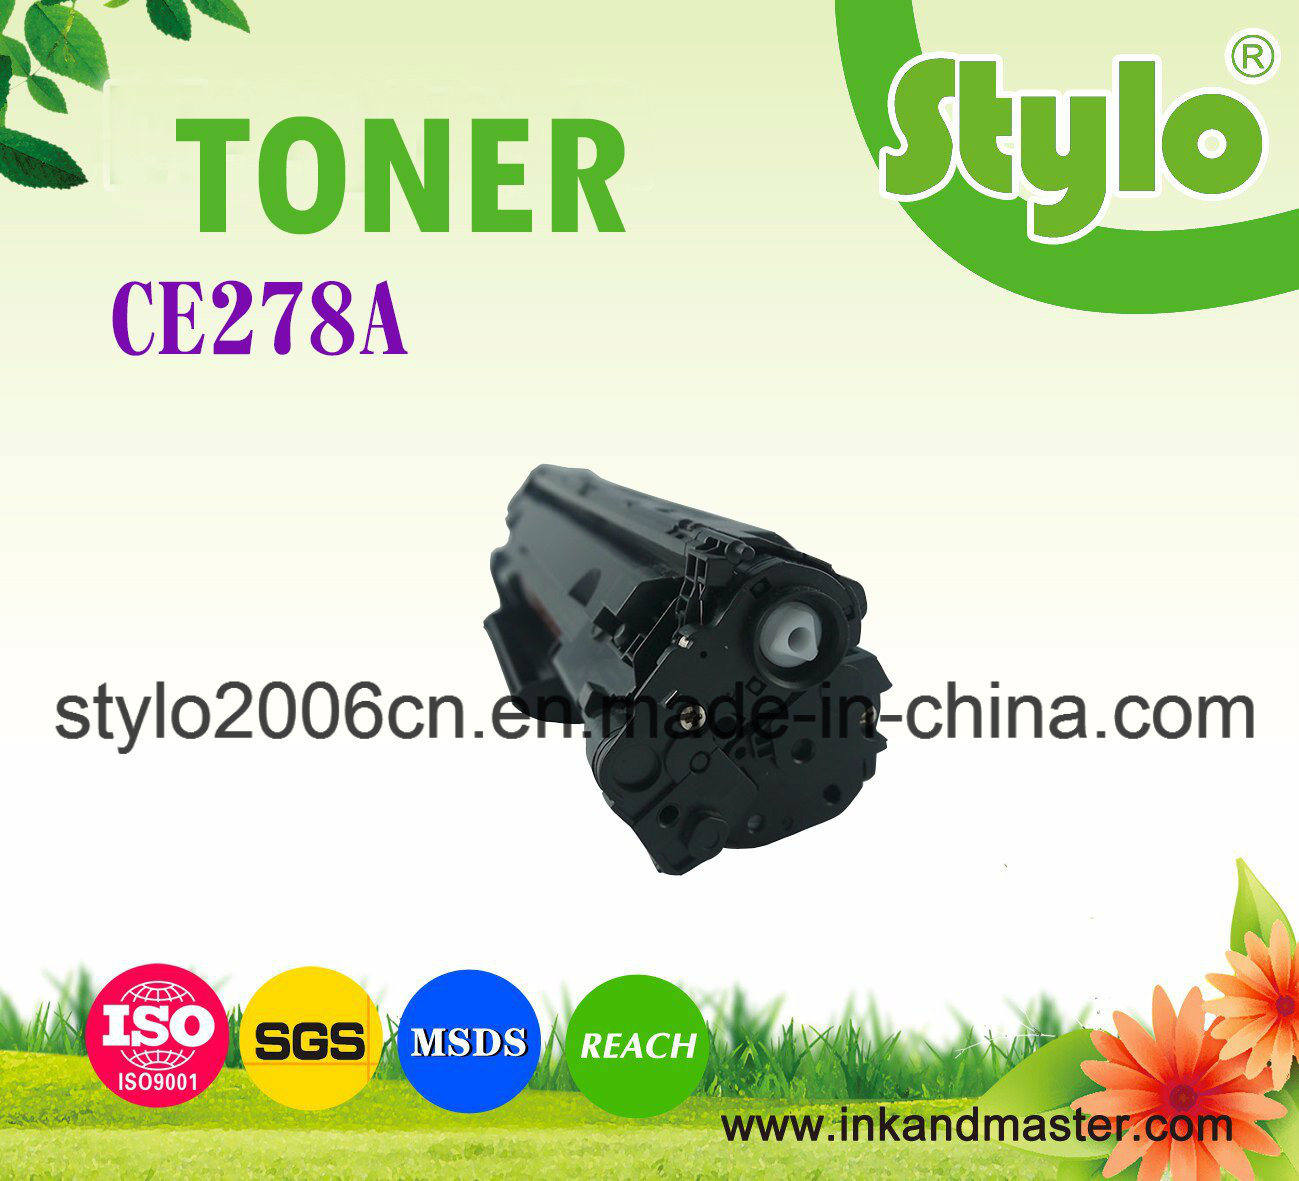 Toner Cartridge Ce278A for Use HP Laserjet Printer